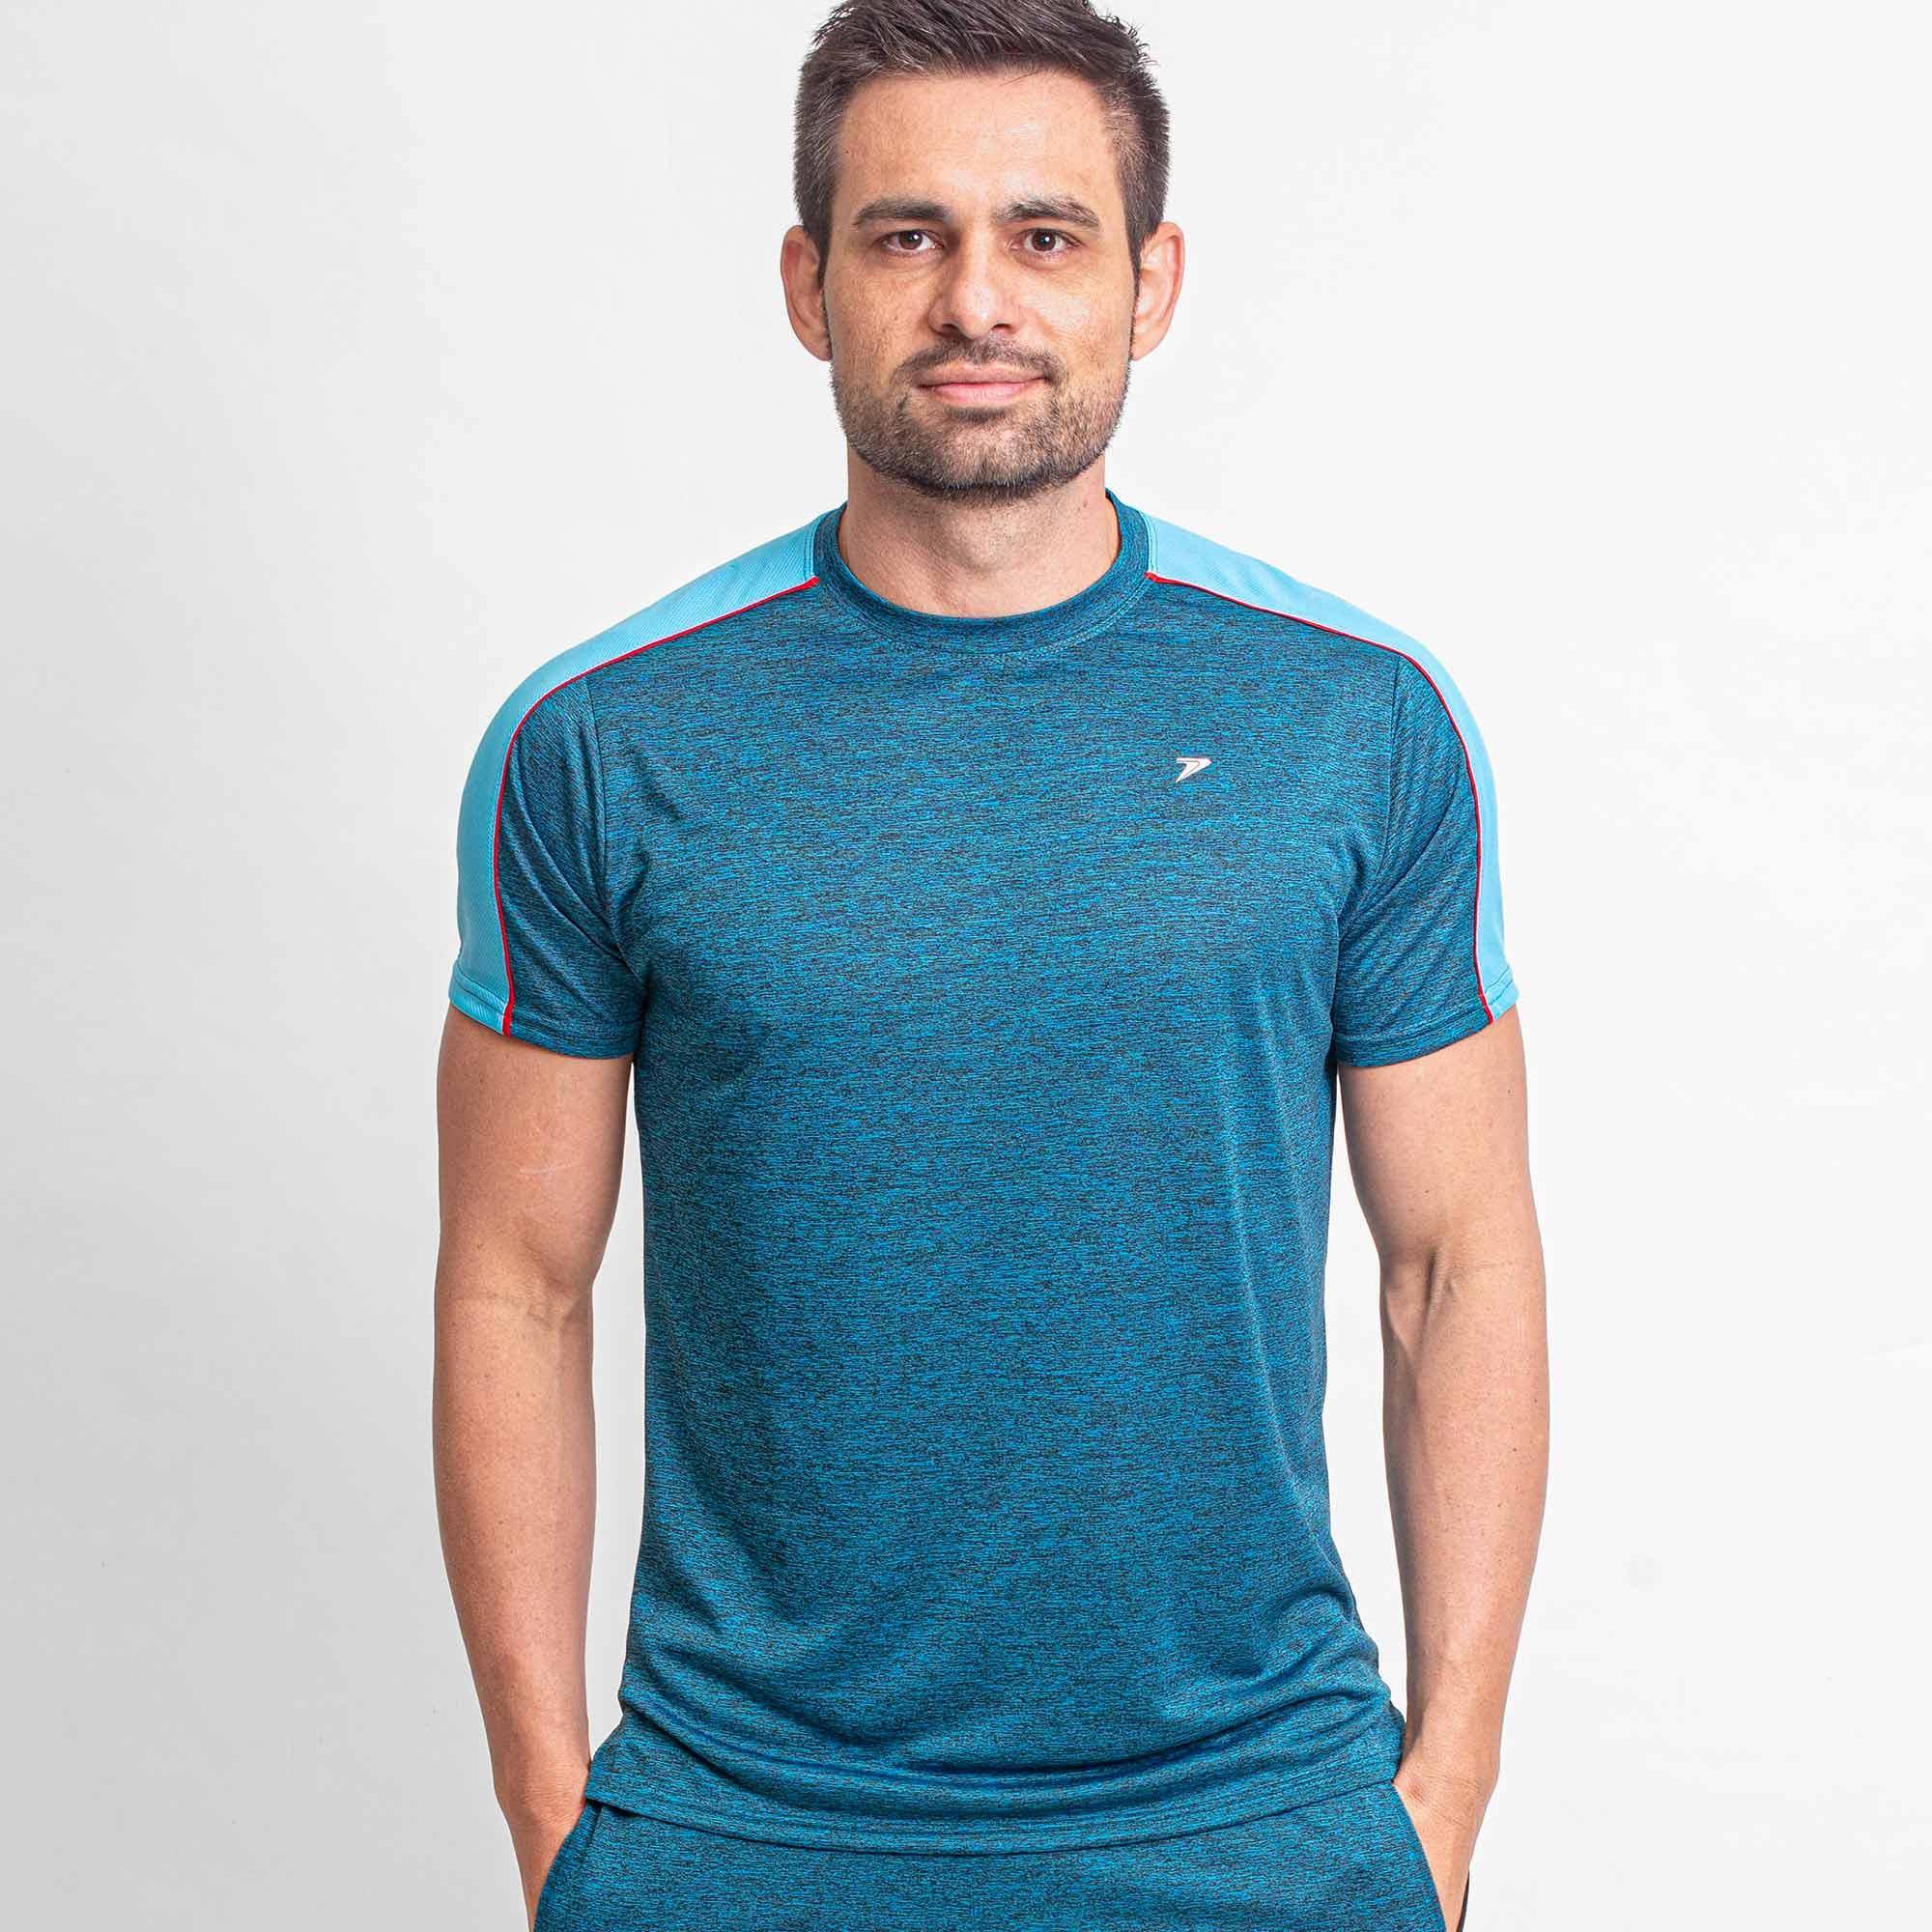 Camiseta Esportiva Sober 04307